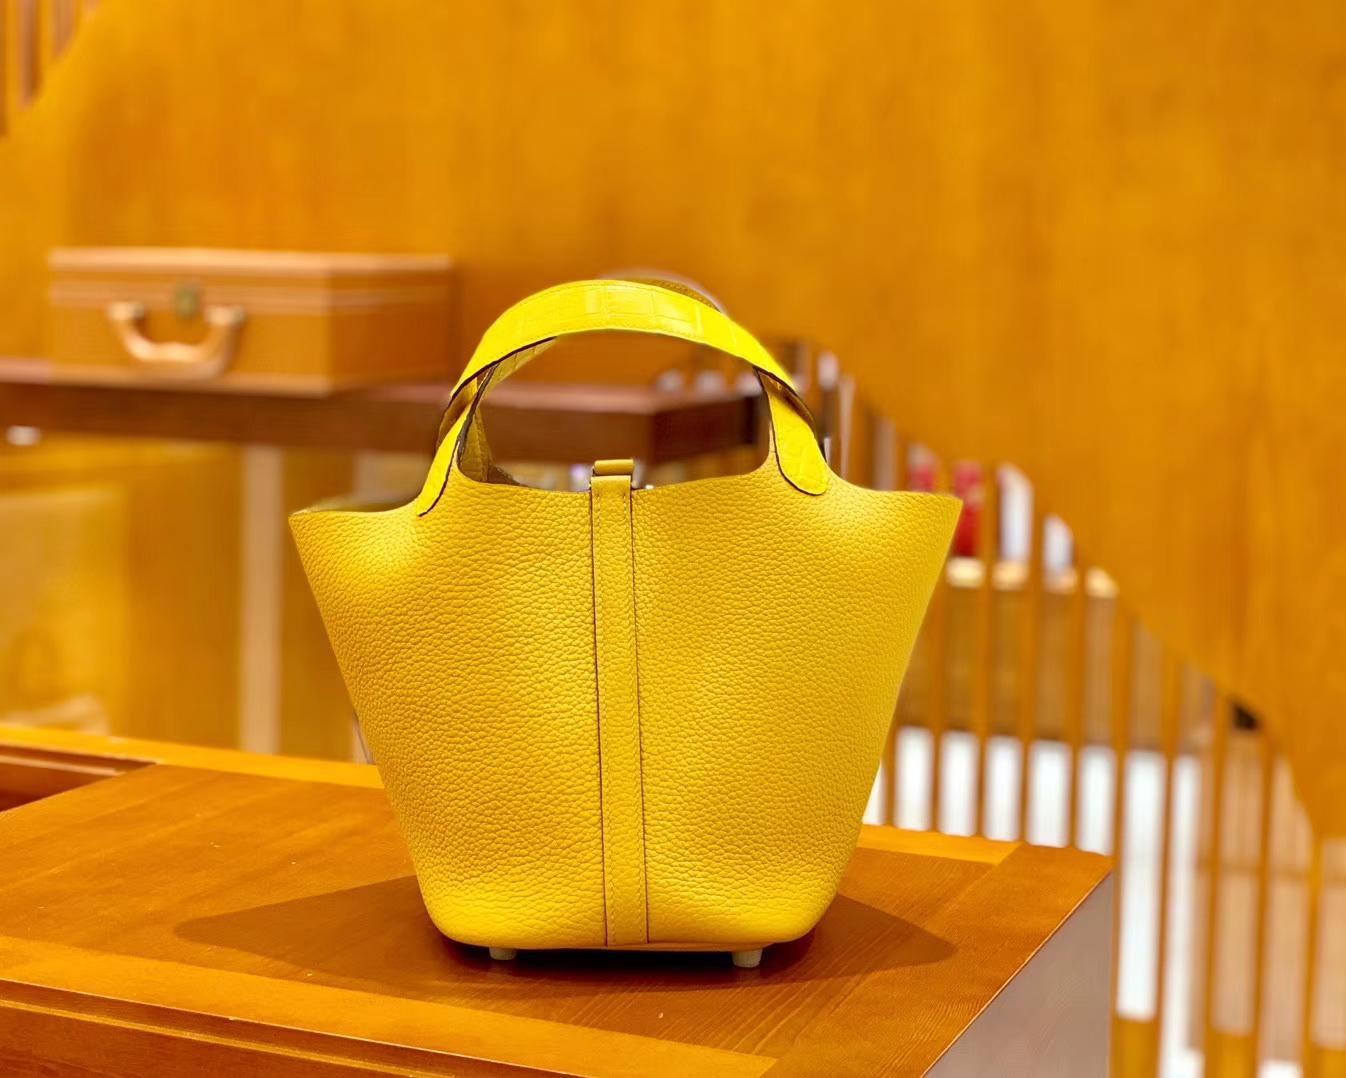 Hermès(爱马仕)Piction 18cm & 迷你2代19cm 鳄鱼皮 琥珀黄9D 火热不减